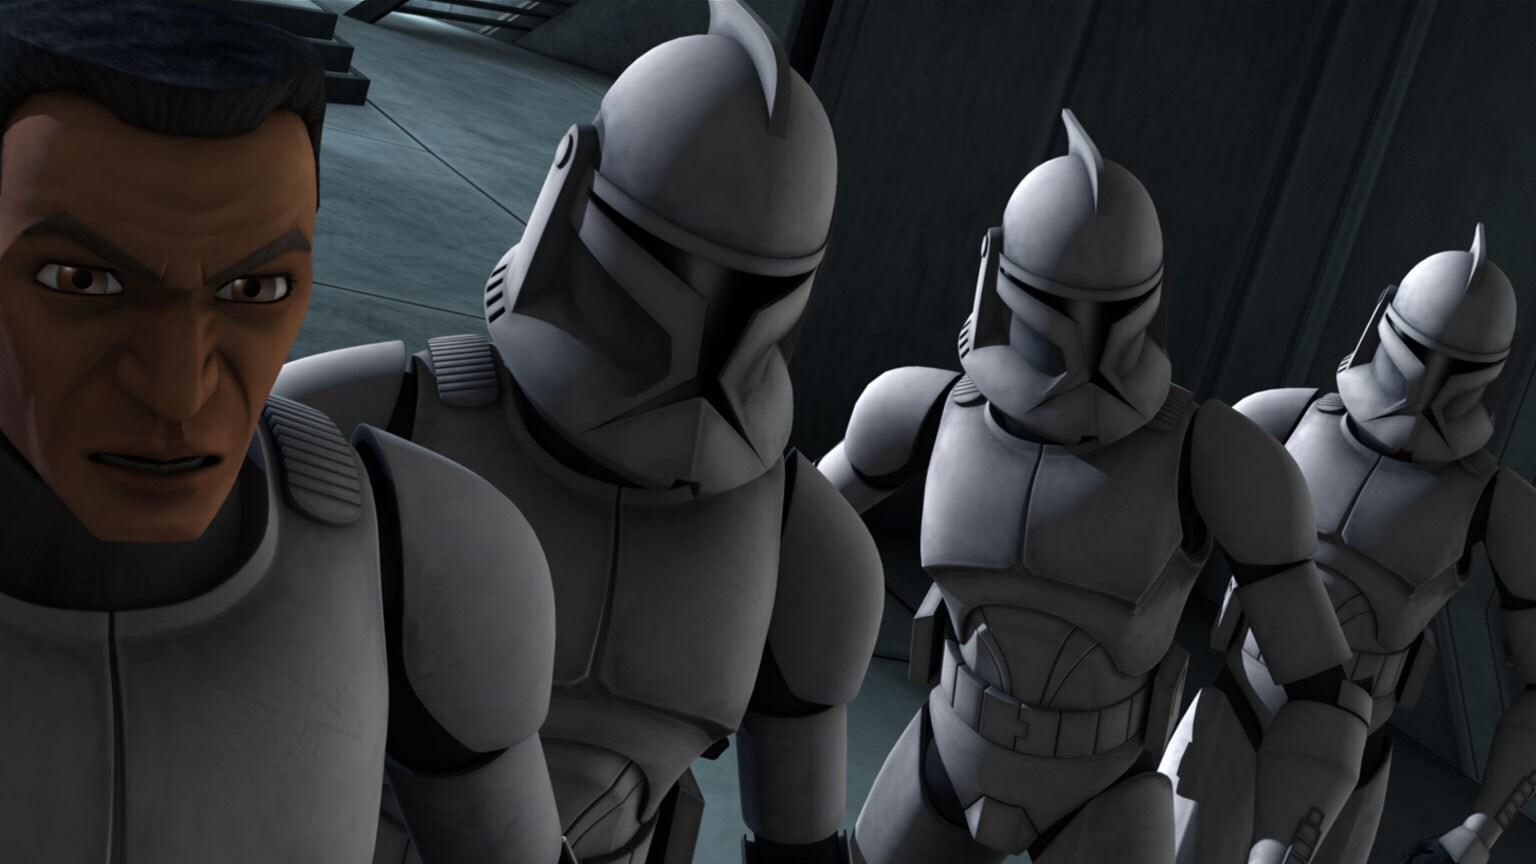 Michael Moreci's 5 Favorite Episodes of Star Wars: The Clone Wars